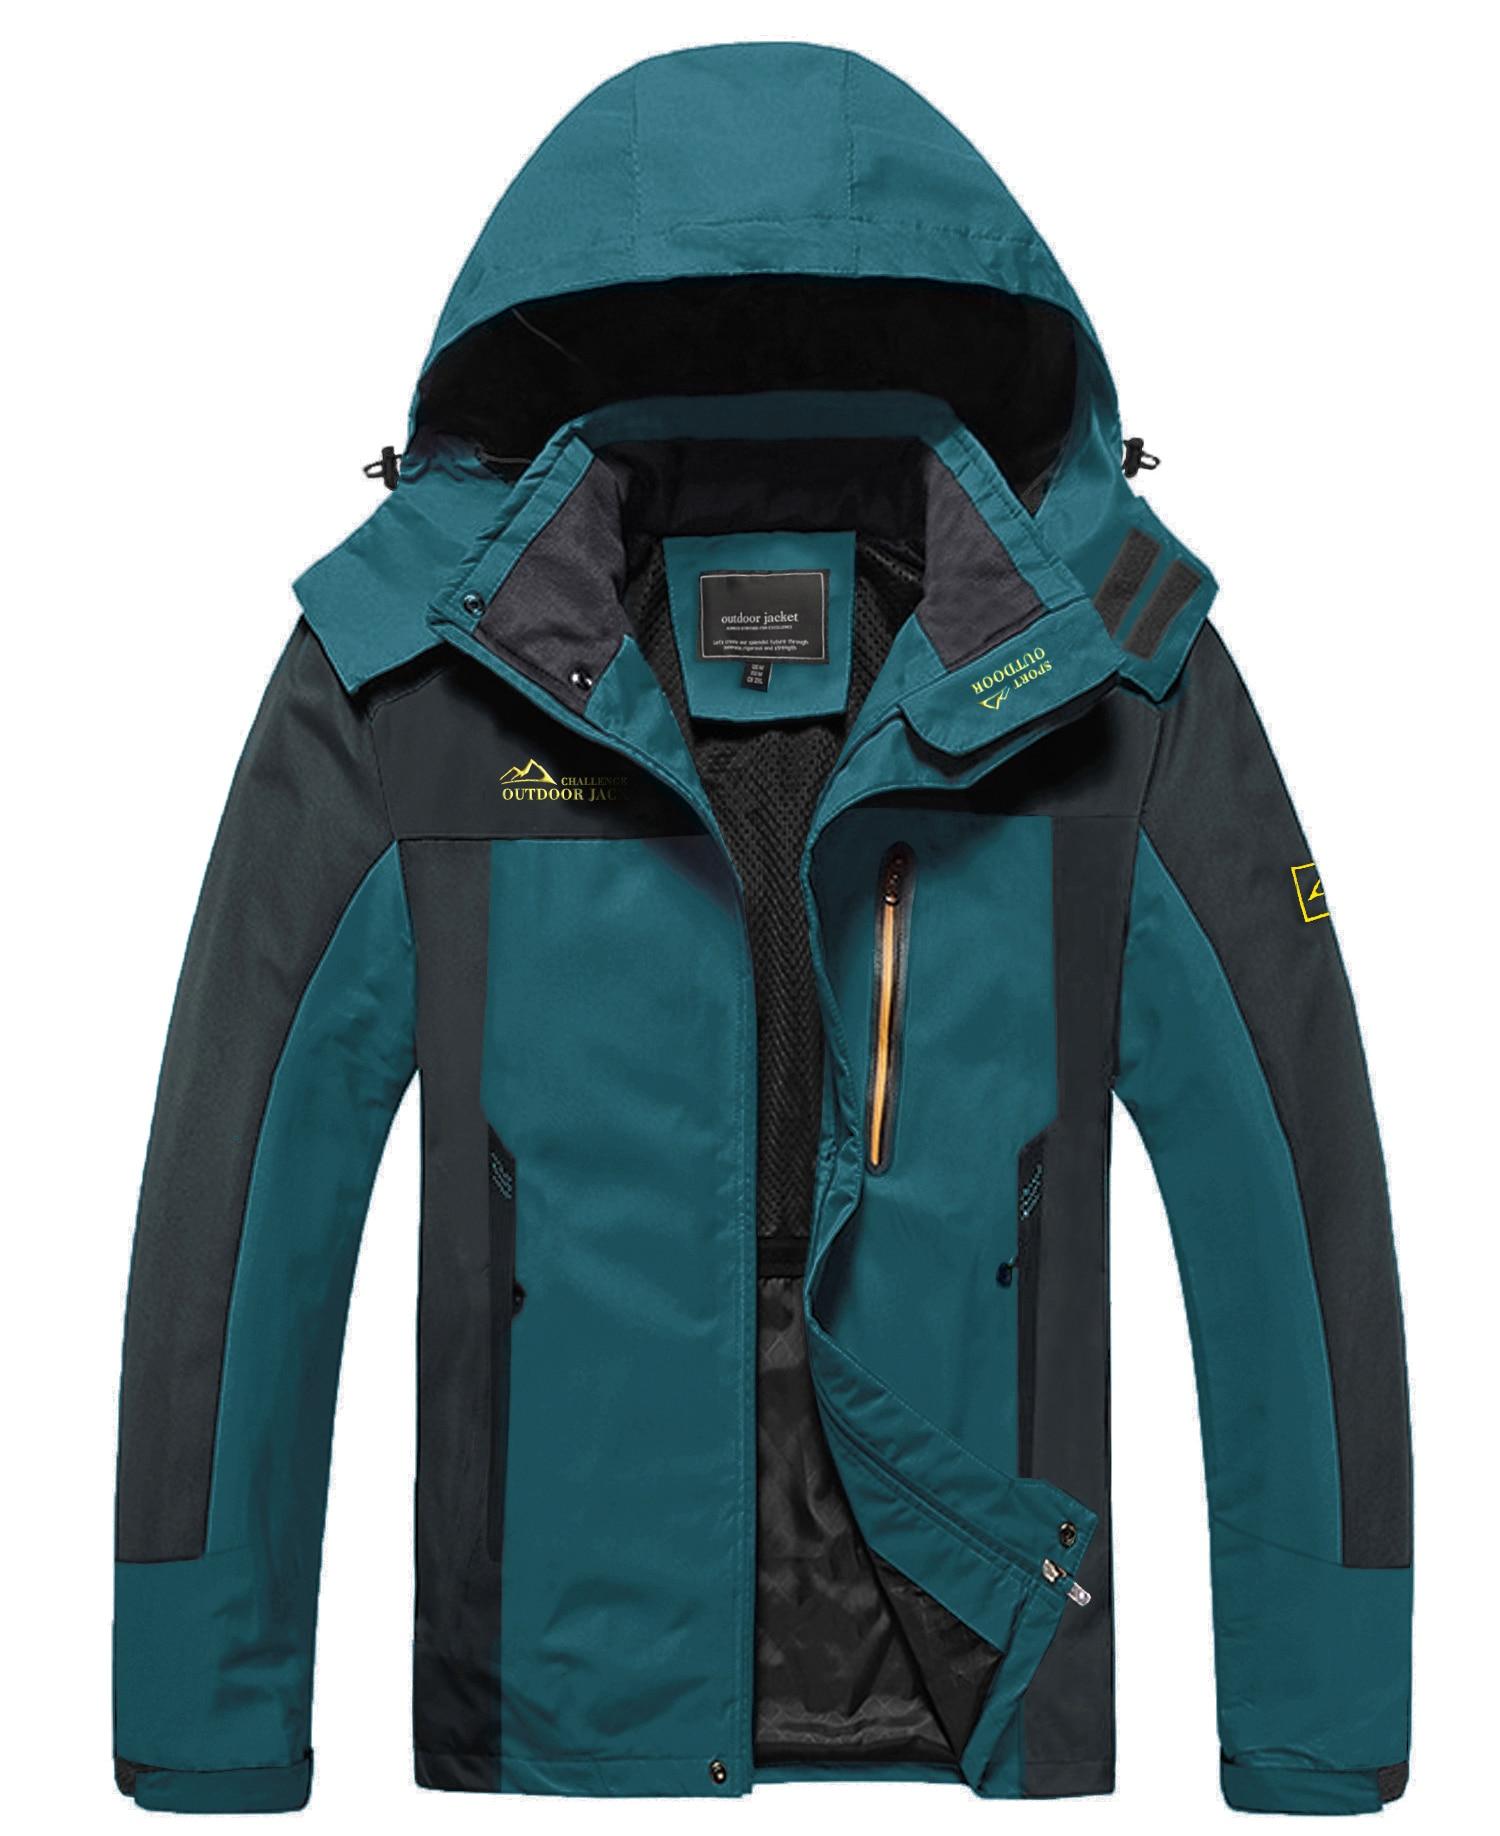 WOLFONROAD Spring Outdoor Waterproof Men's Hiking Travel Jackets Coats Fishing Climbing Raincoats Lightweight Windbreaker Male